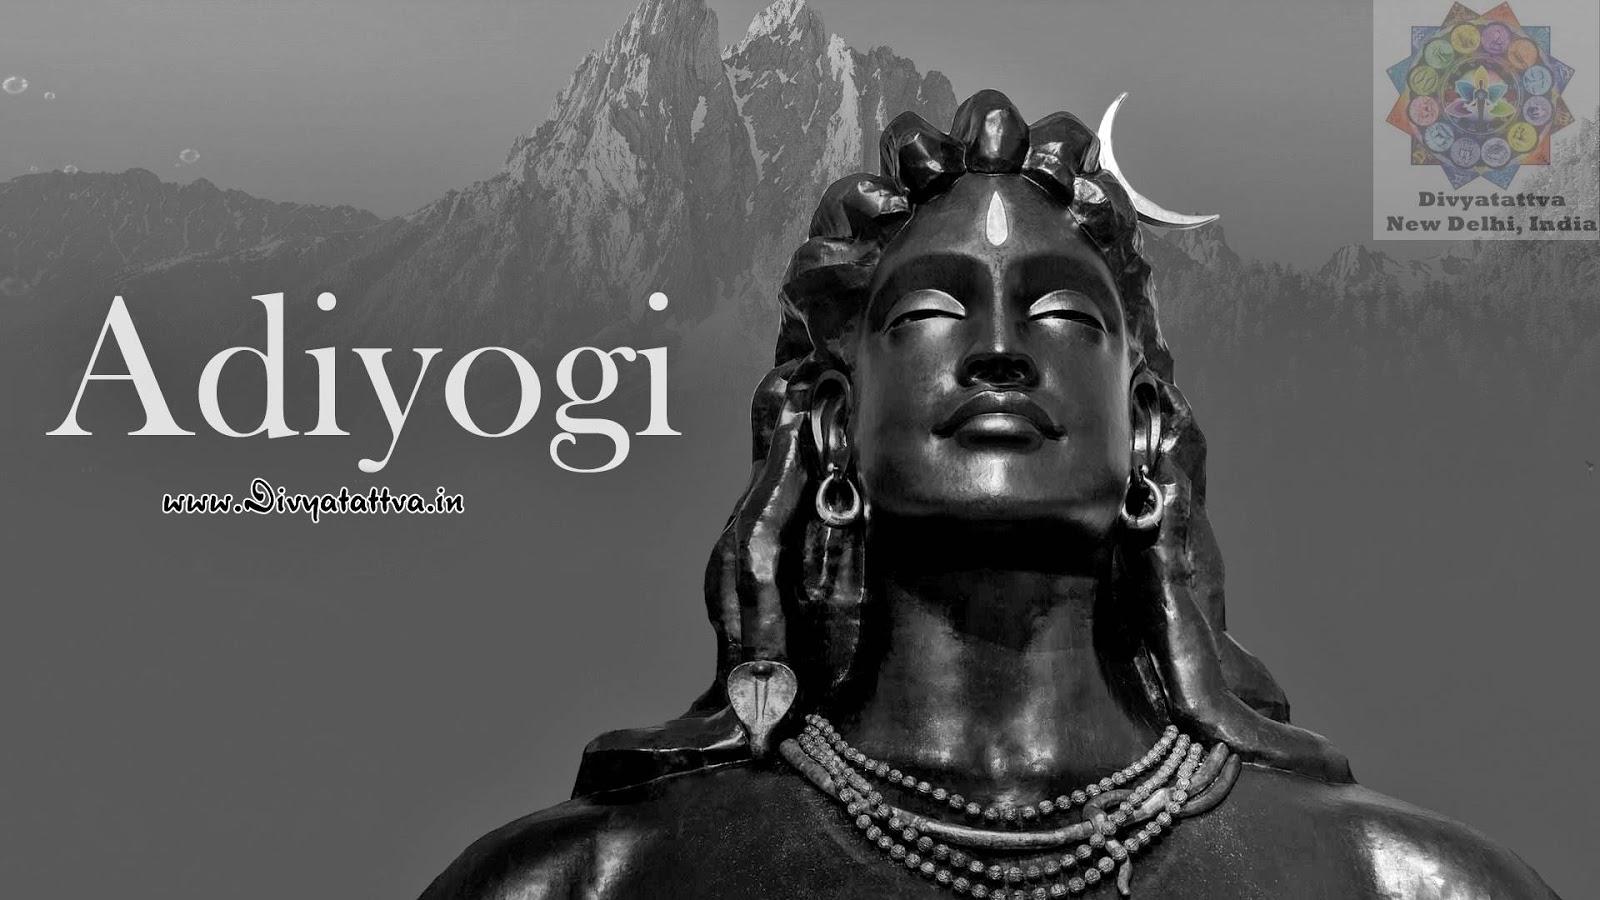 Lord Shiva Wallpapers High Resolution: Divyatattva Astrology Free Horoscopes Psychic Tarot Yoga